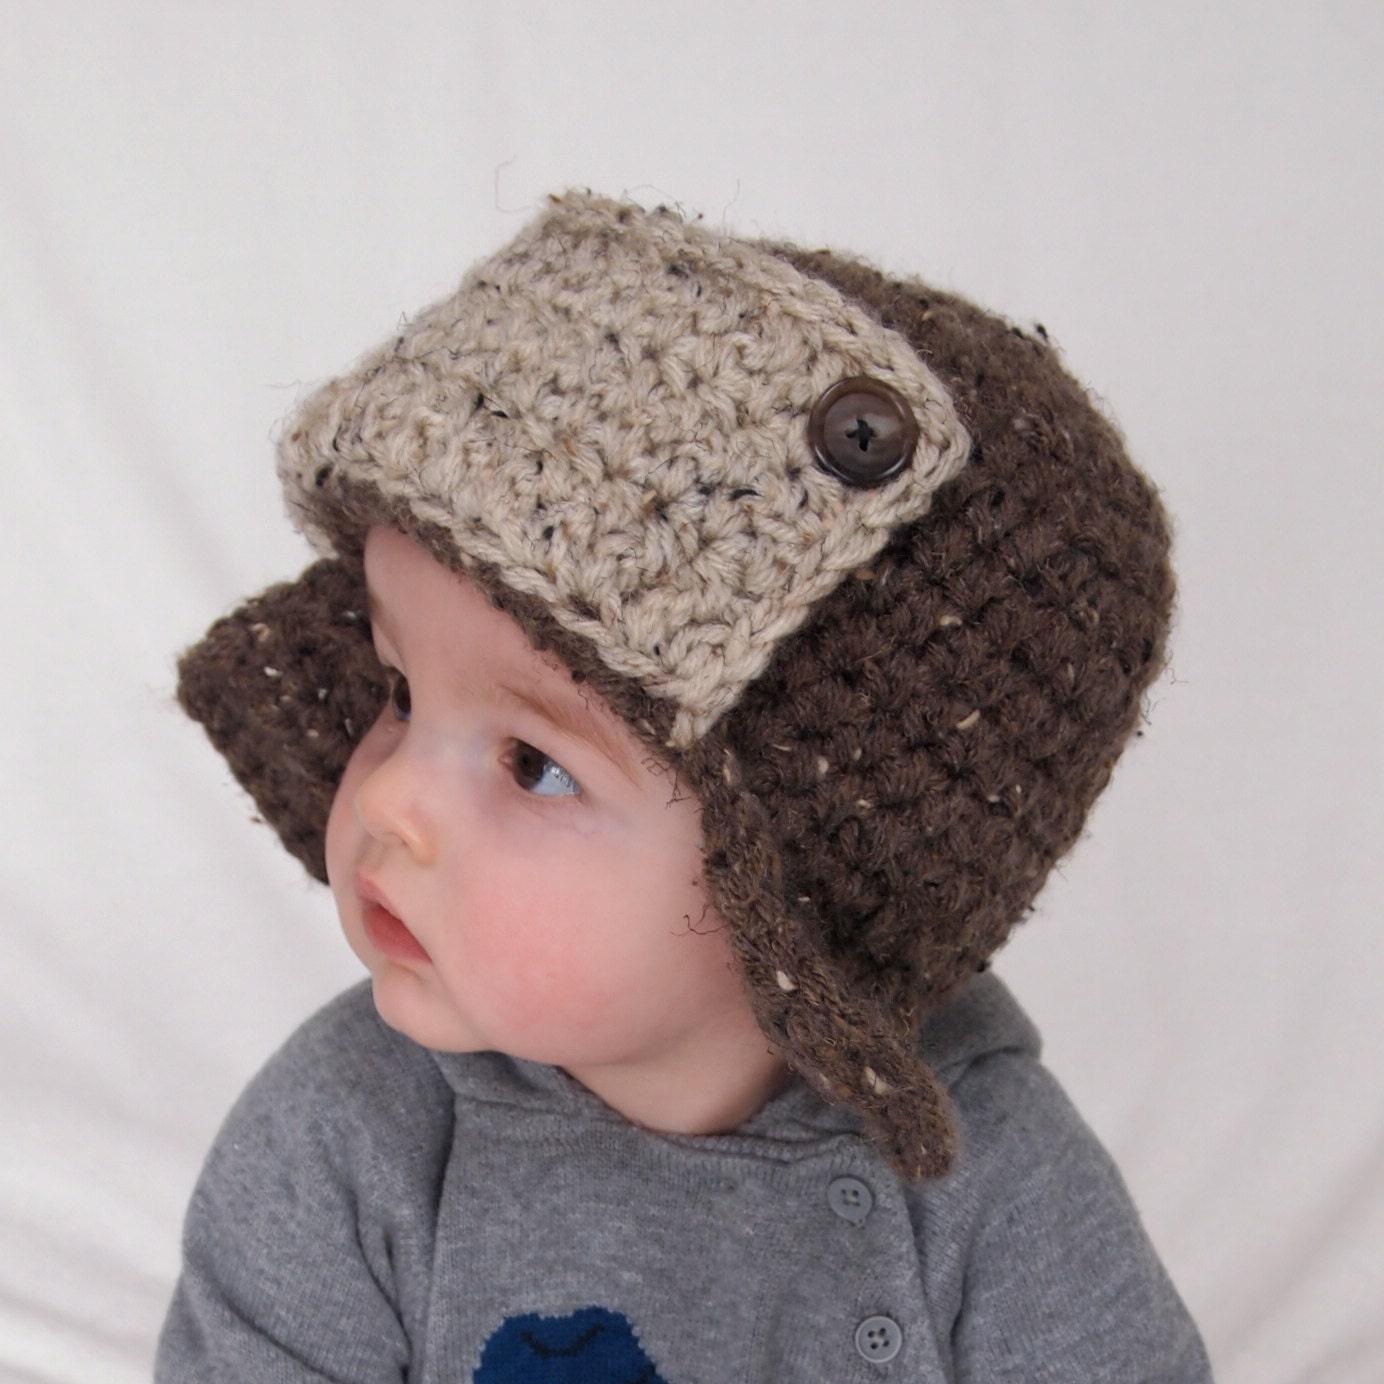 Child Crochet Aviator Hat Pattern : Baby Boy Hat Crochet Aviator Hat Infant Photo by BabyGraceHats